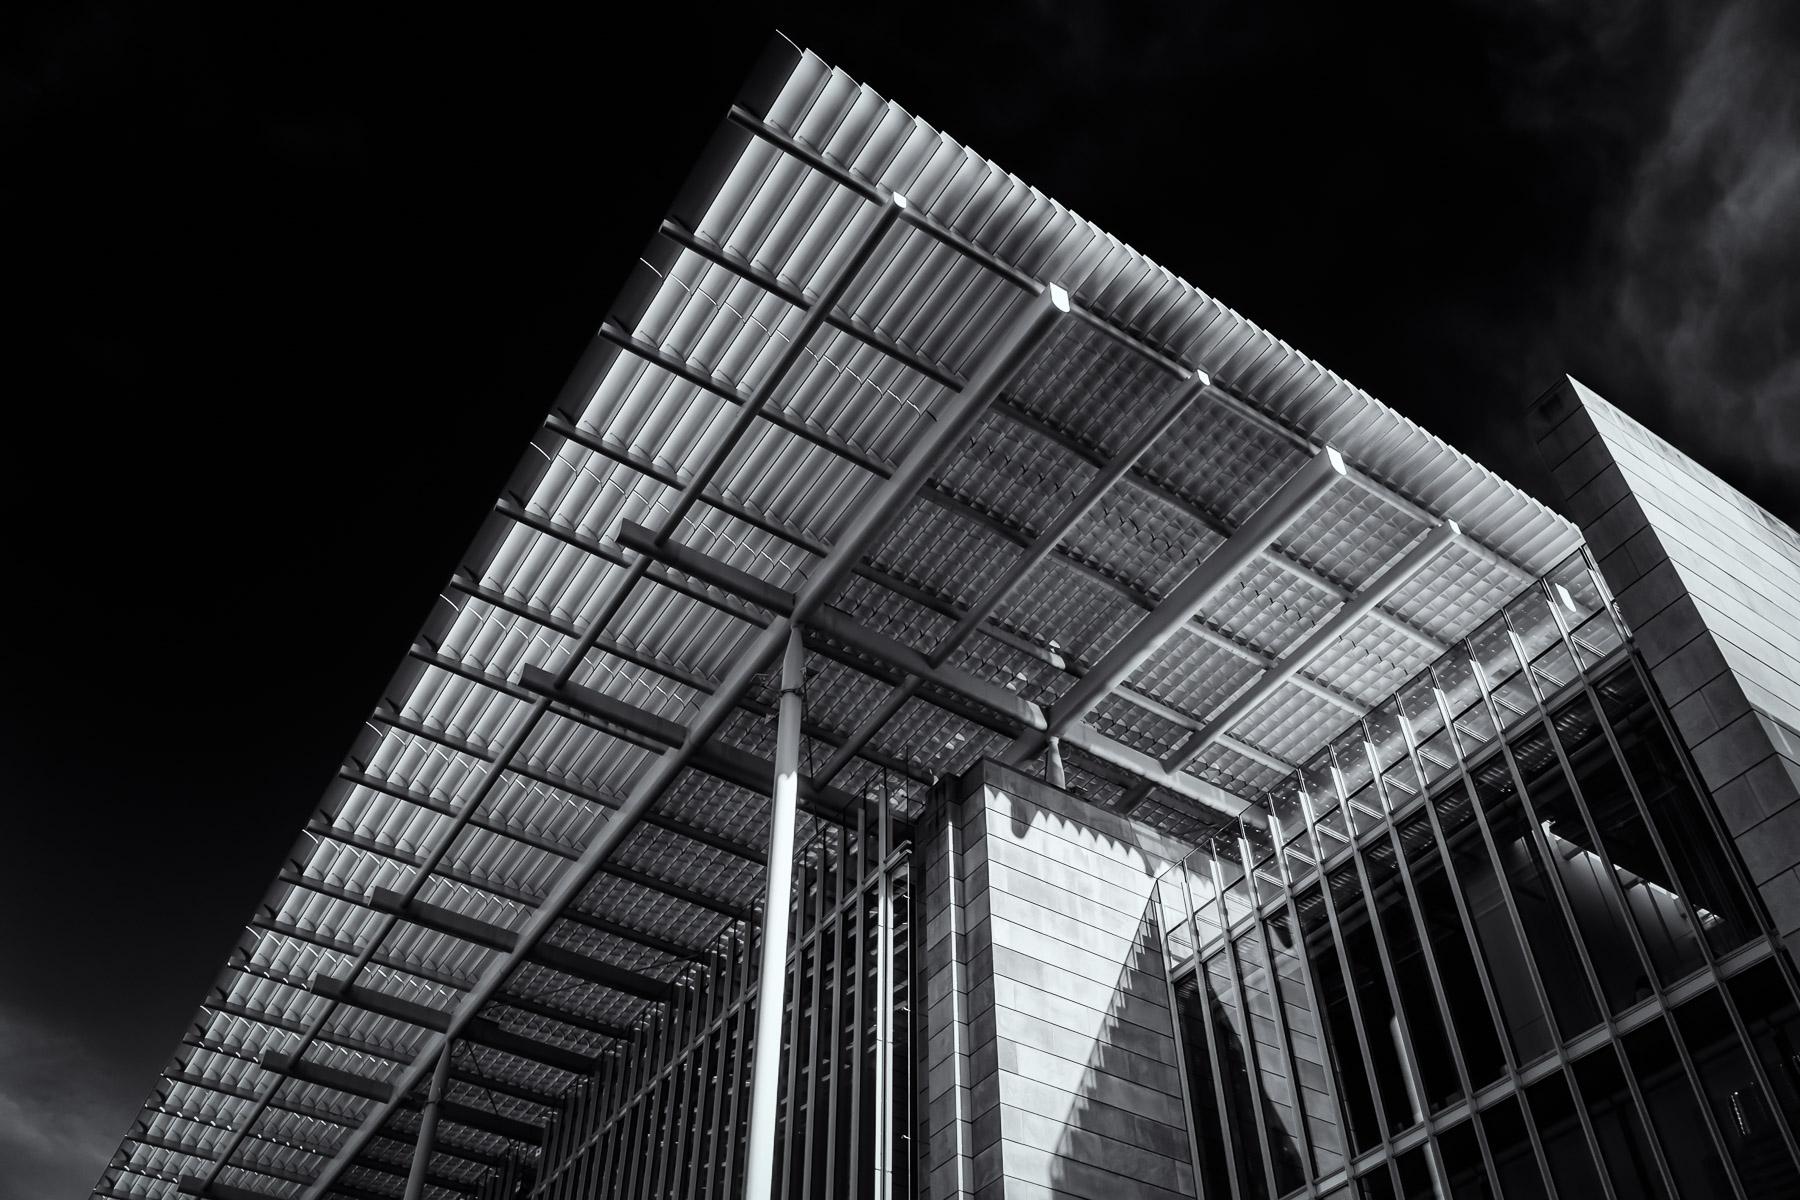 Lightness Exterior architectura - mattgharvey | ello